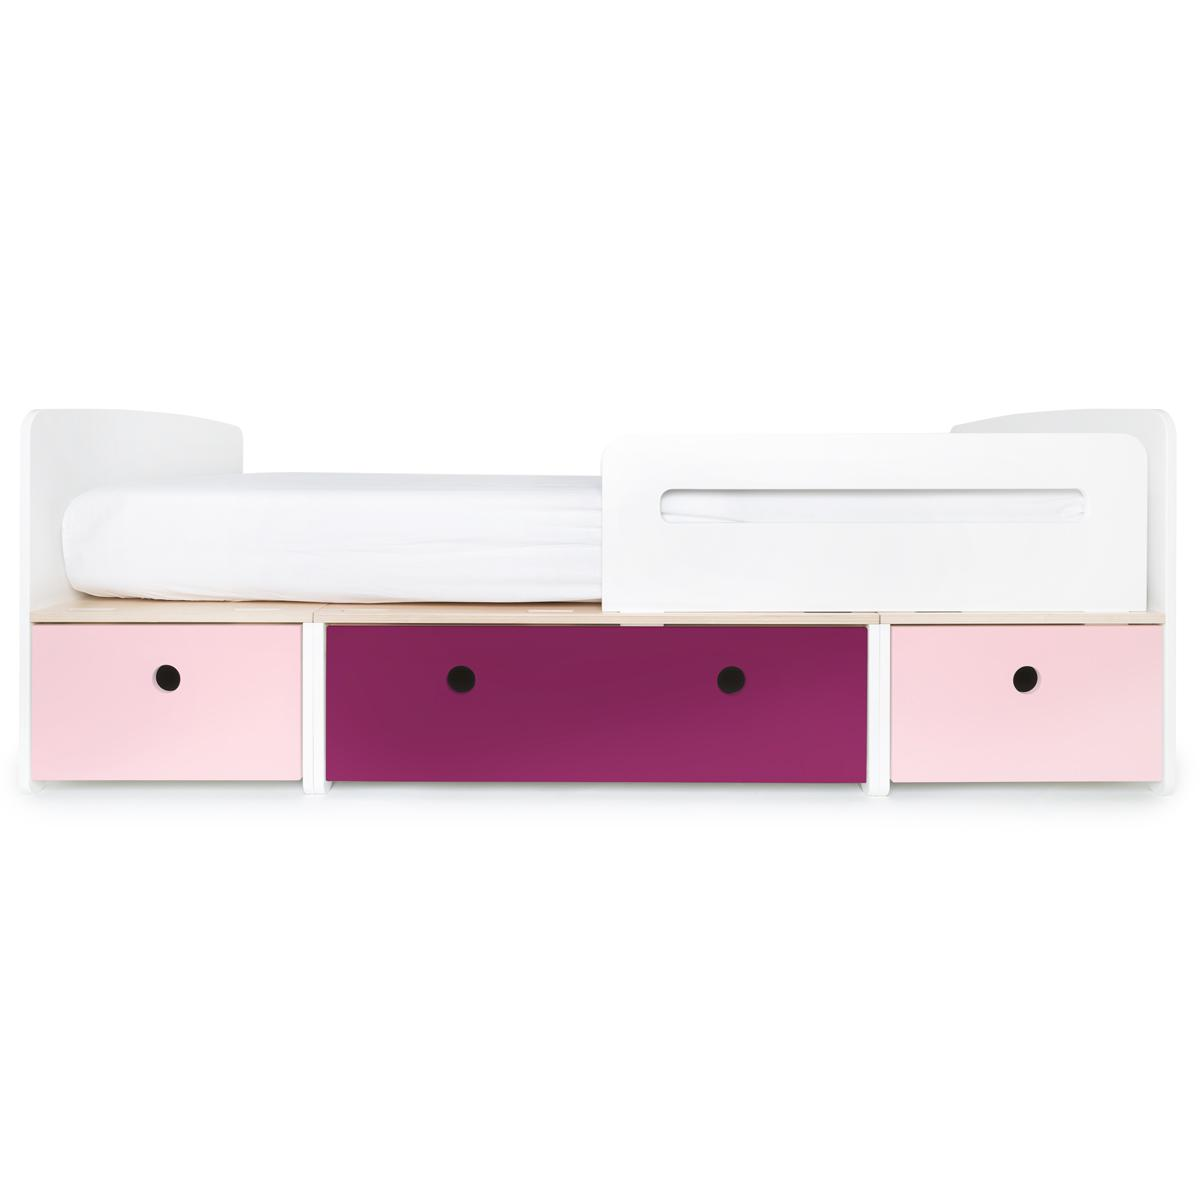 Lit évolutif 90x200cm COLORFLEX Abitare Kids sweet pink-plum-sweet pink